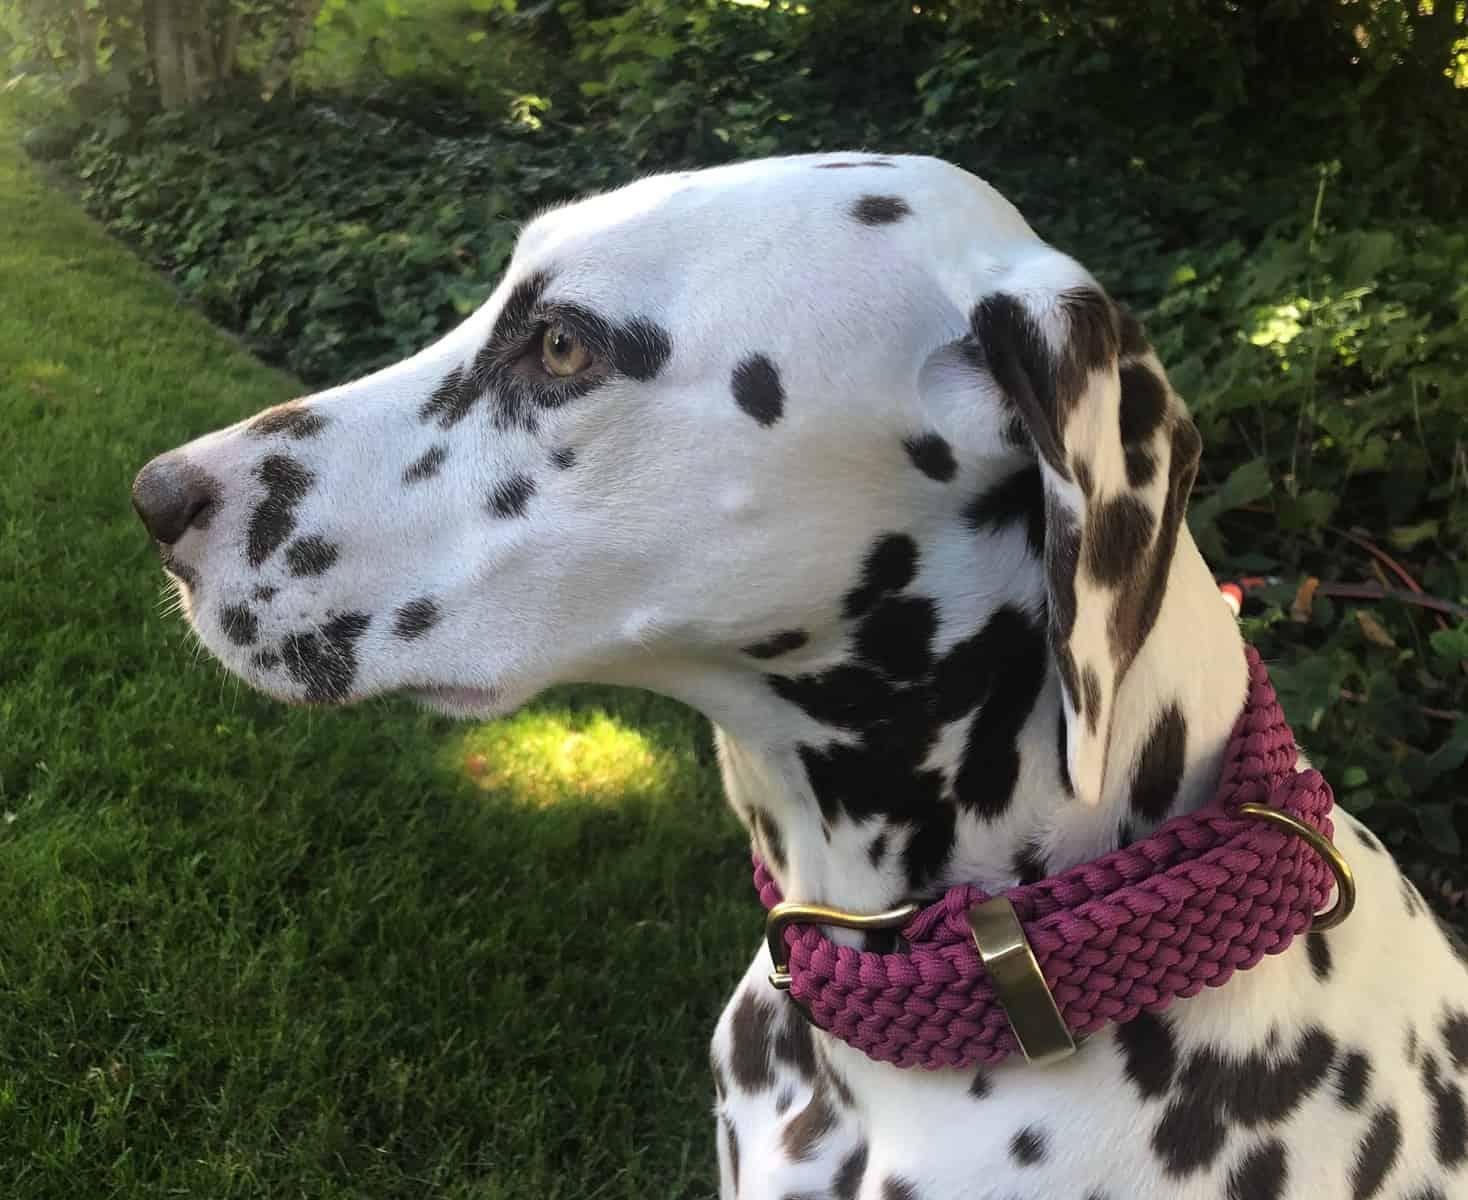 Hundehalsband Paracord Burgundy 3 cm breit stufenlos verstellbar